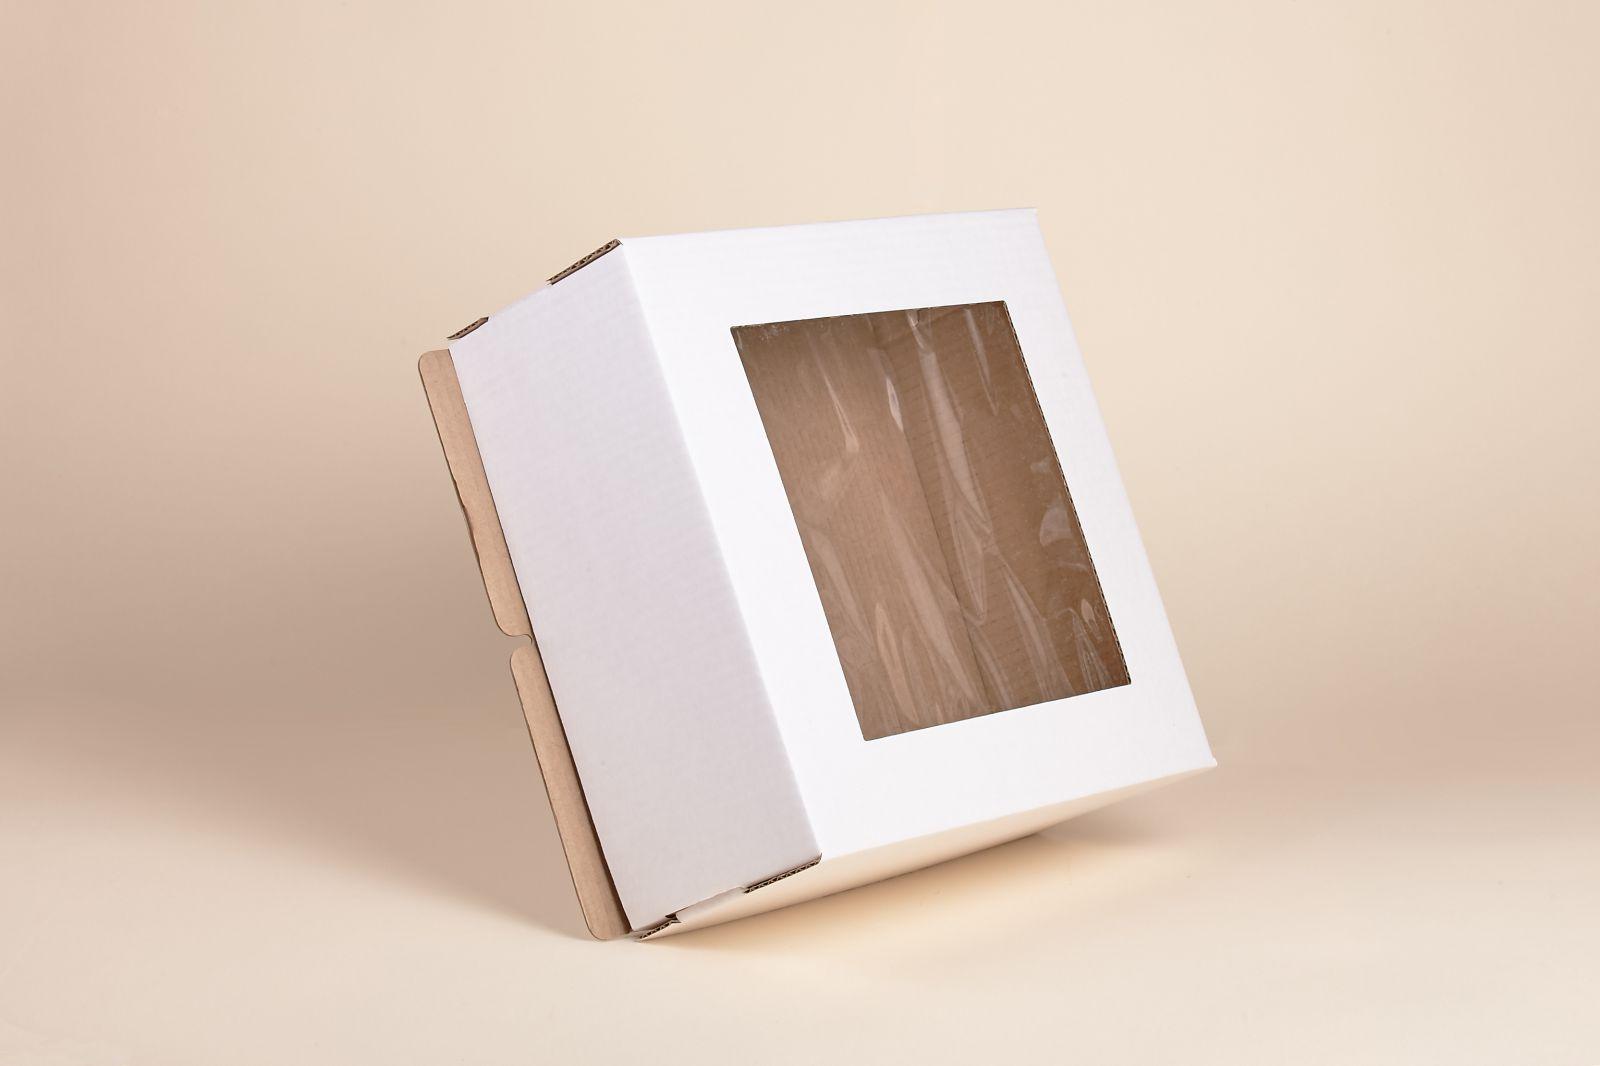 Купить коробки для тортов